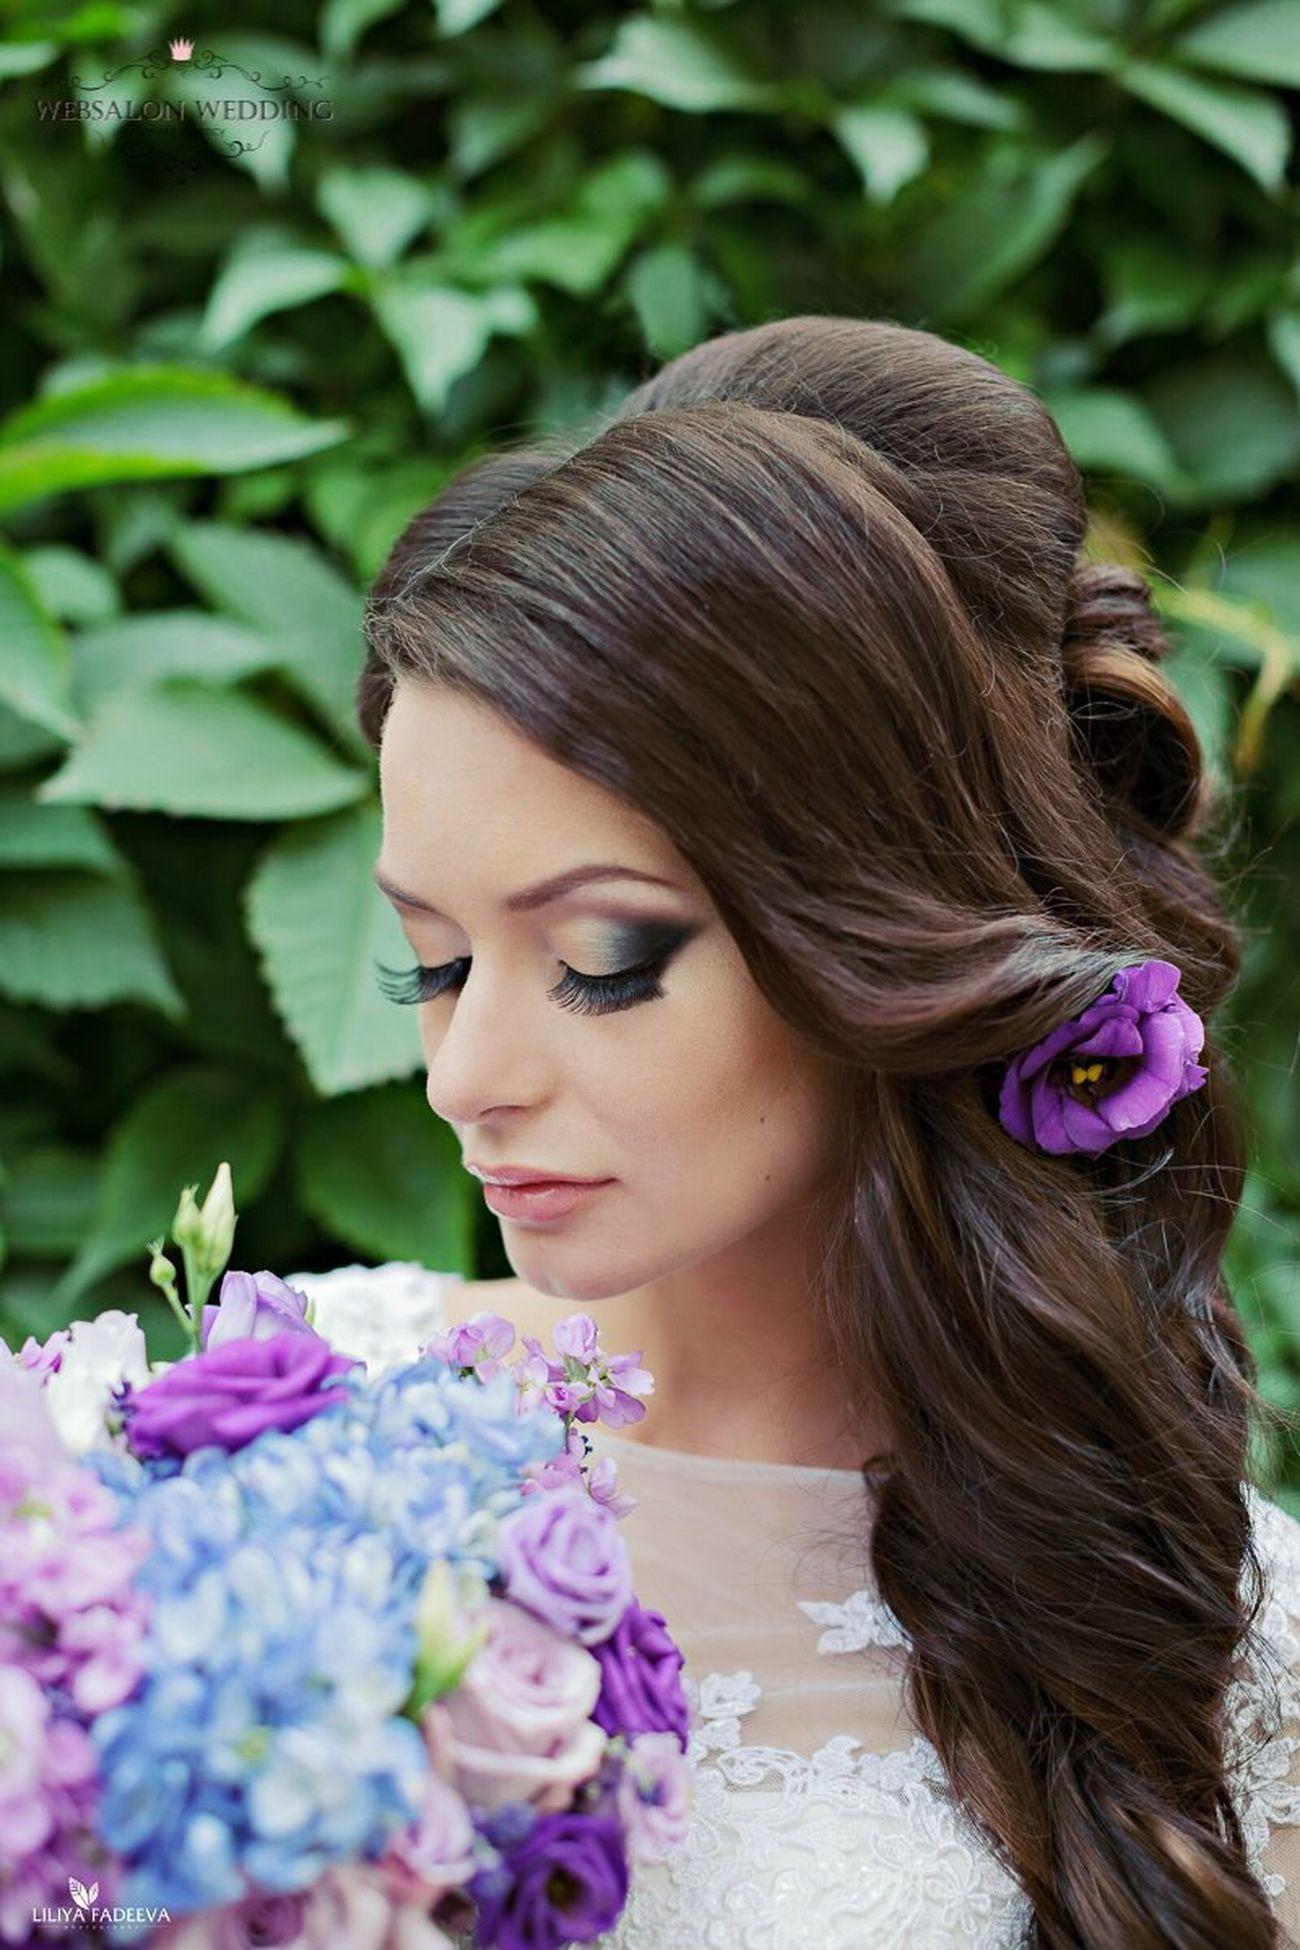 Novia2015 Wedding2015 Weddingdress Weddingdetails